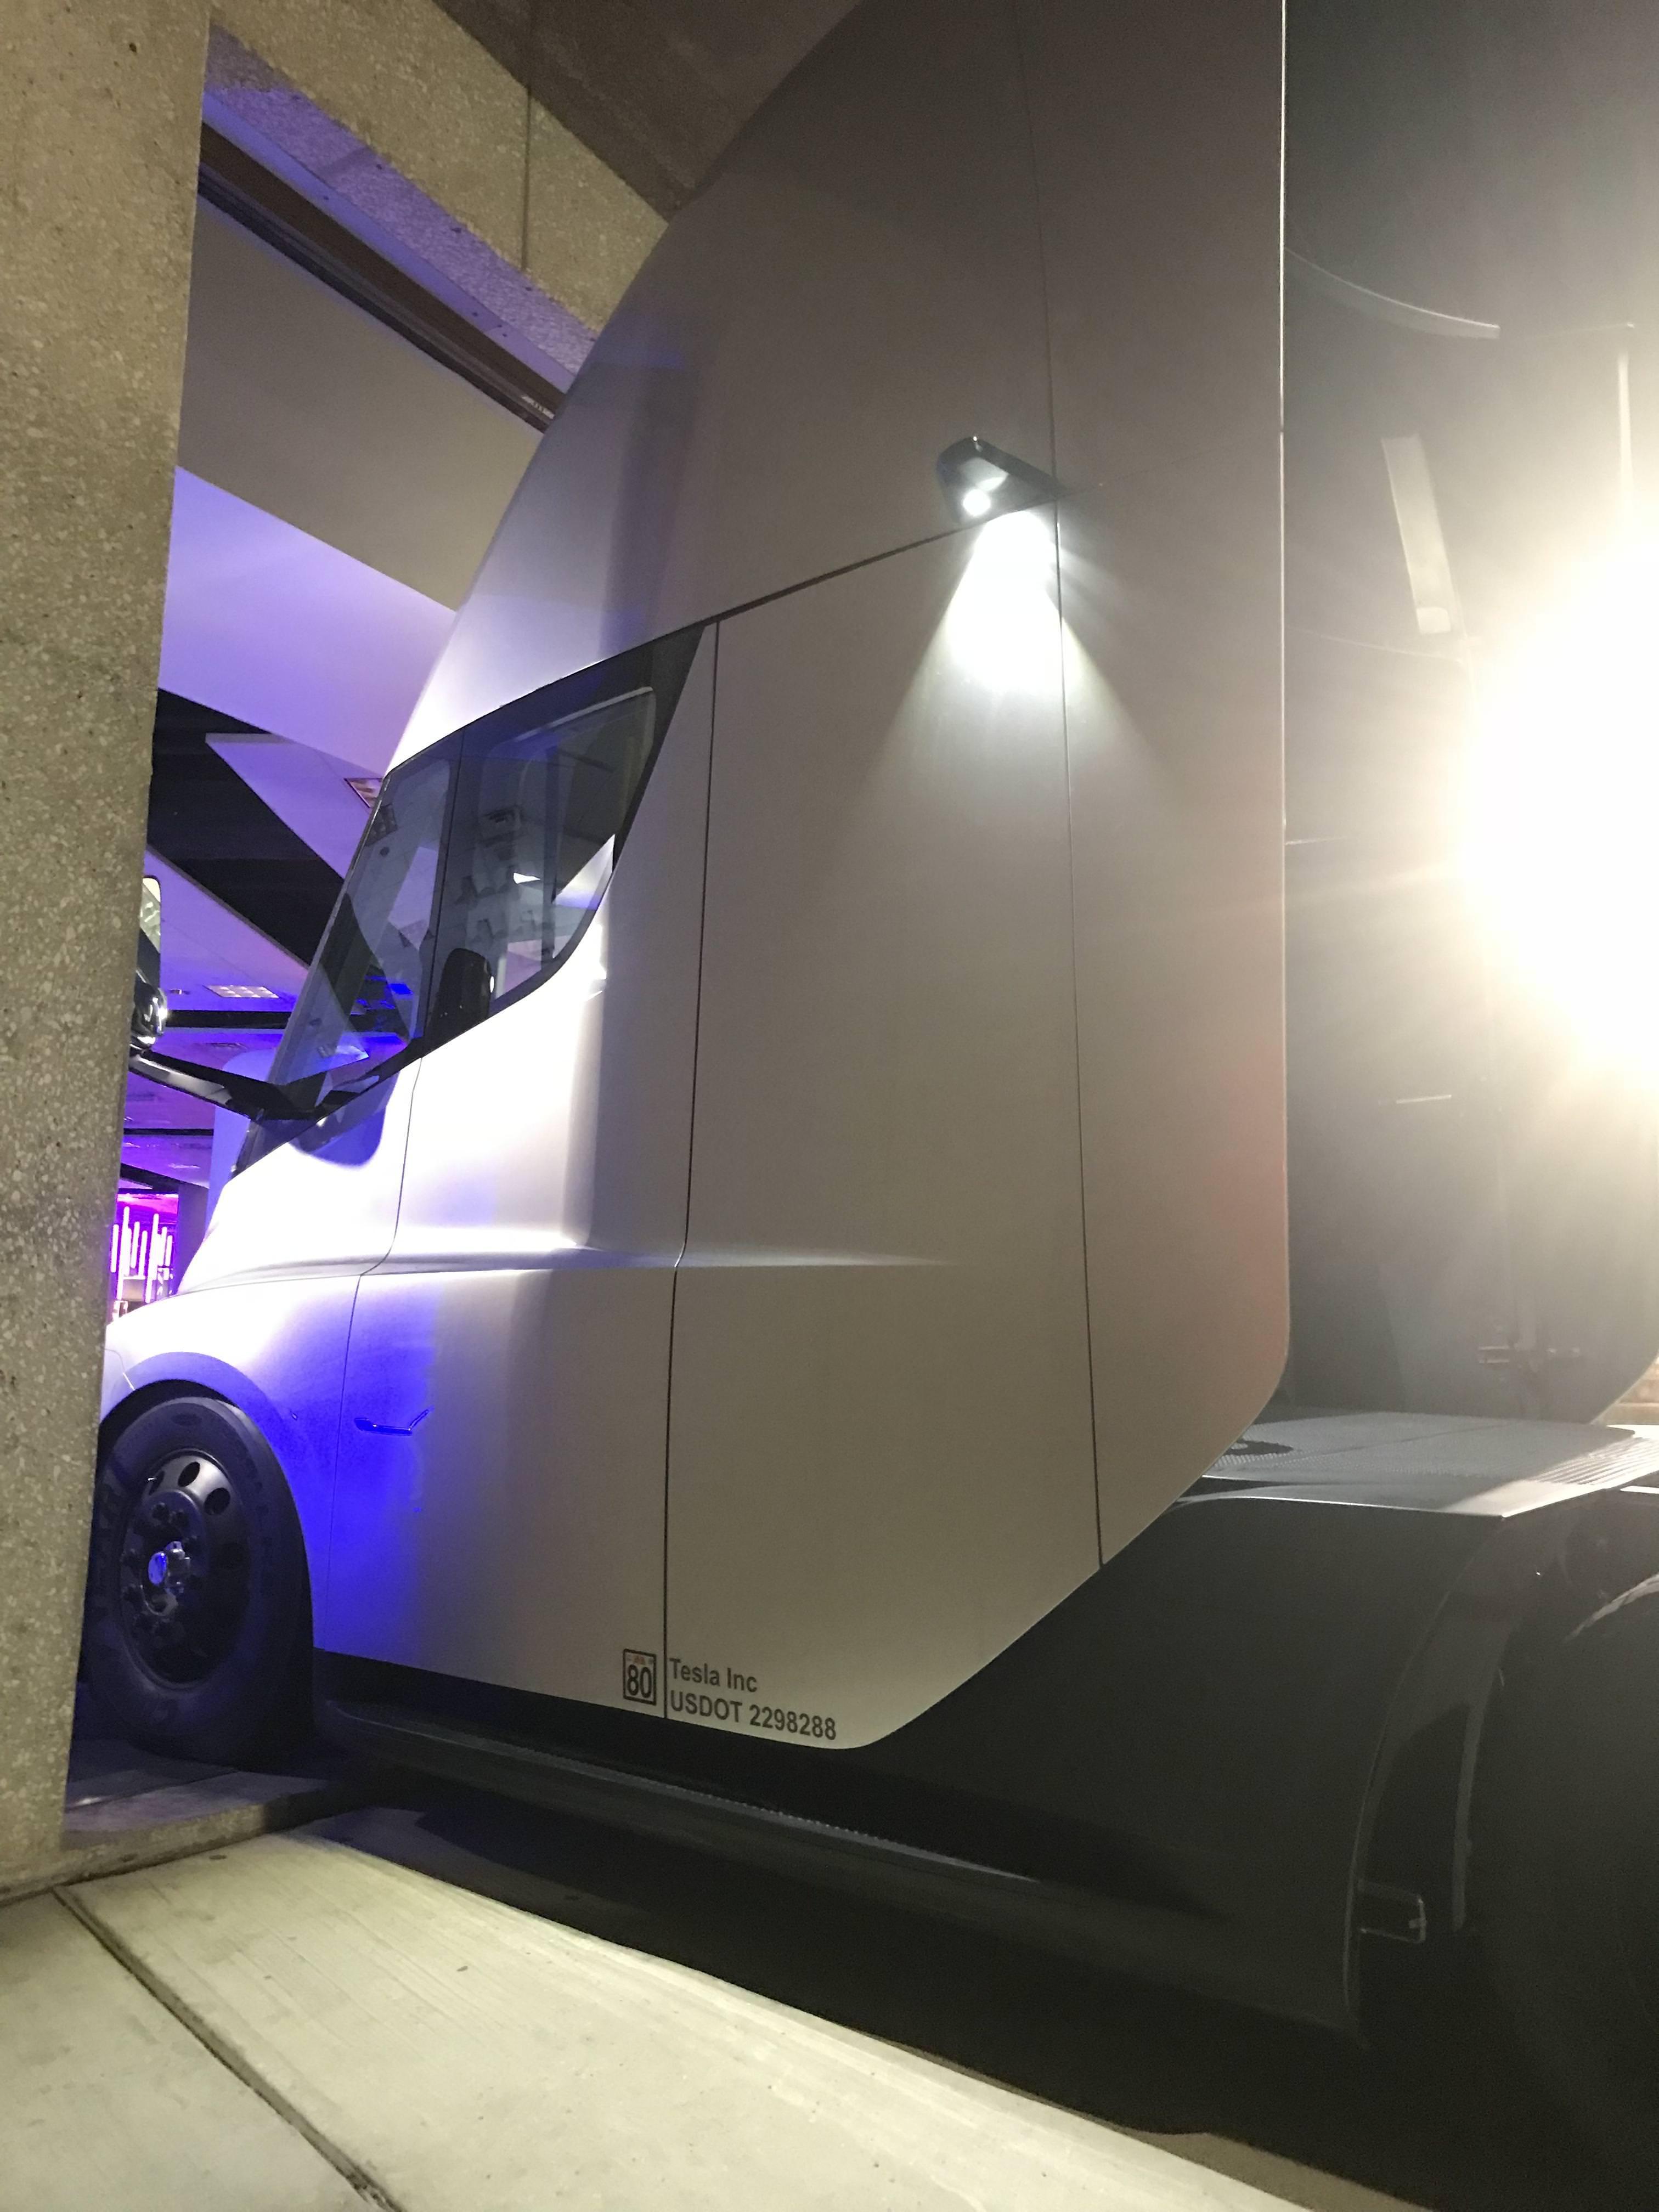 Tesla Semi PepsiCo Plano TX (3) [Credit: Ryan O'Donnell/Imugr]